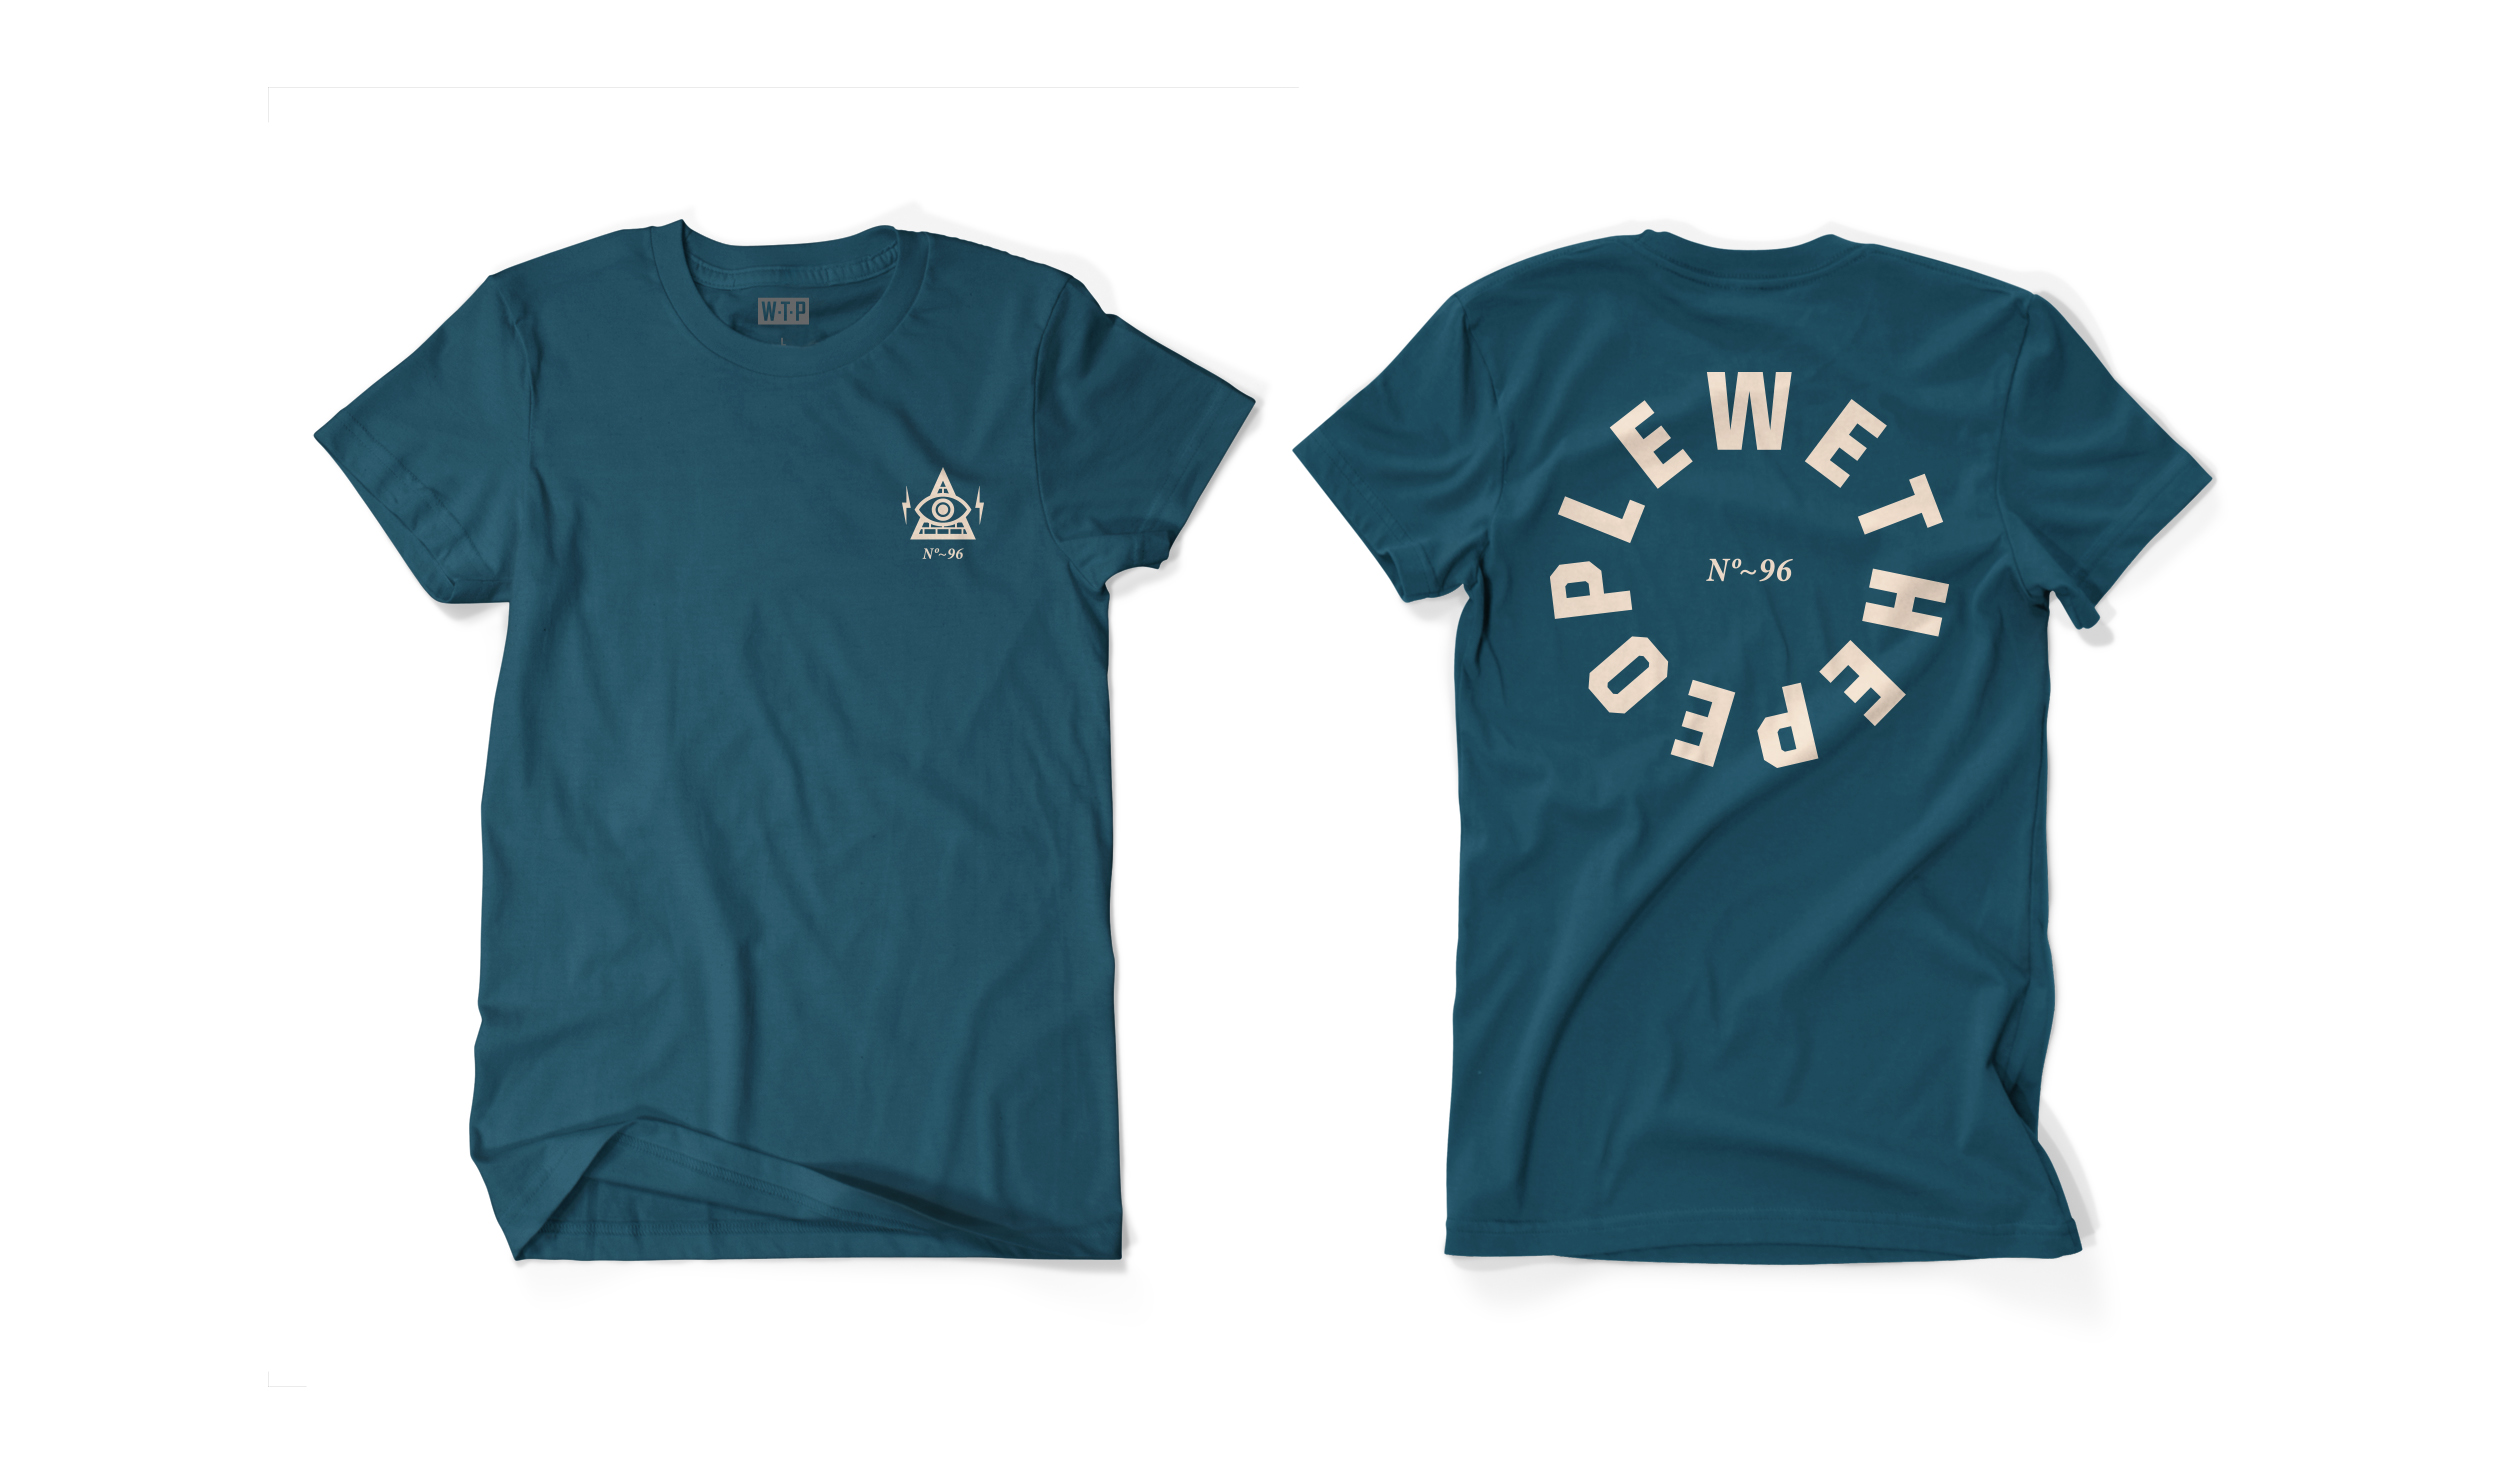 Wethepeople BMX Illuminati T-Shirt in blaugrün